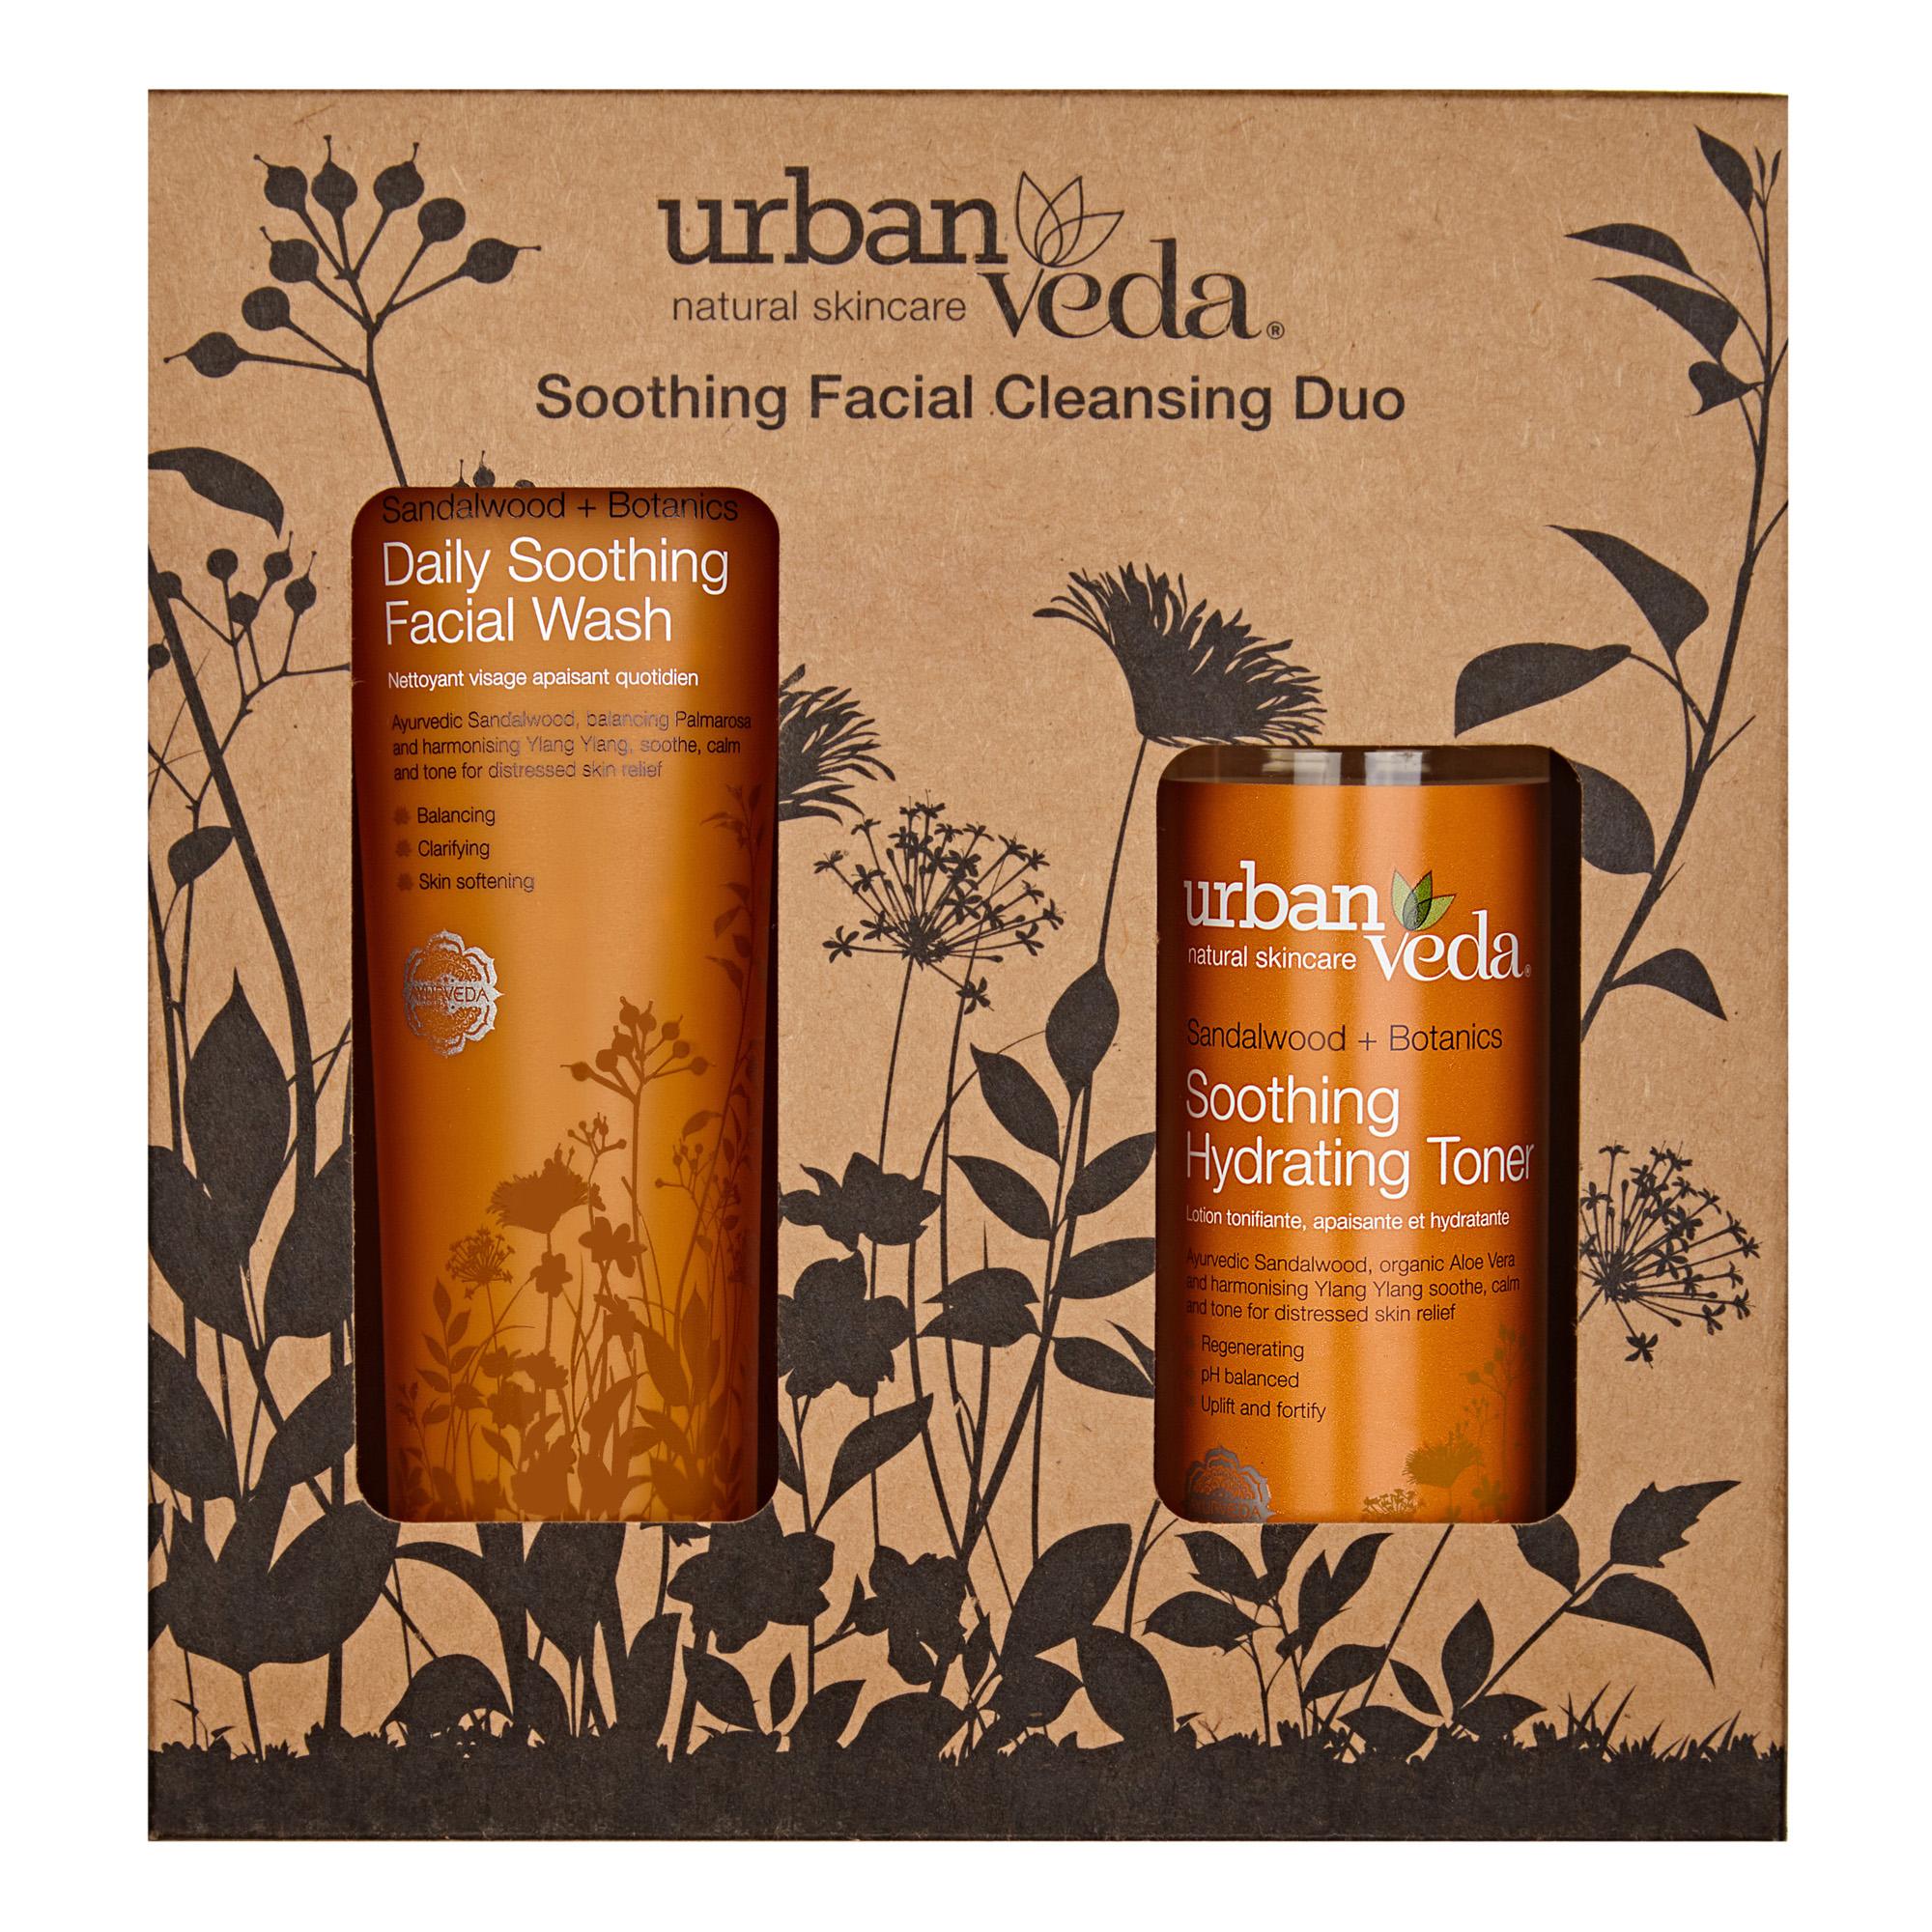 Urban Veda | Urban Veda Soothing Facial Cleansing Duo